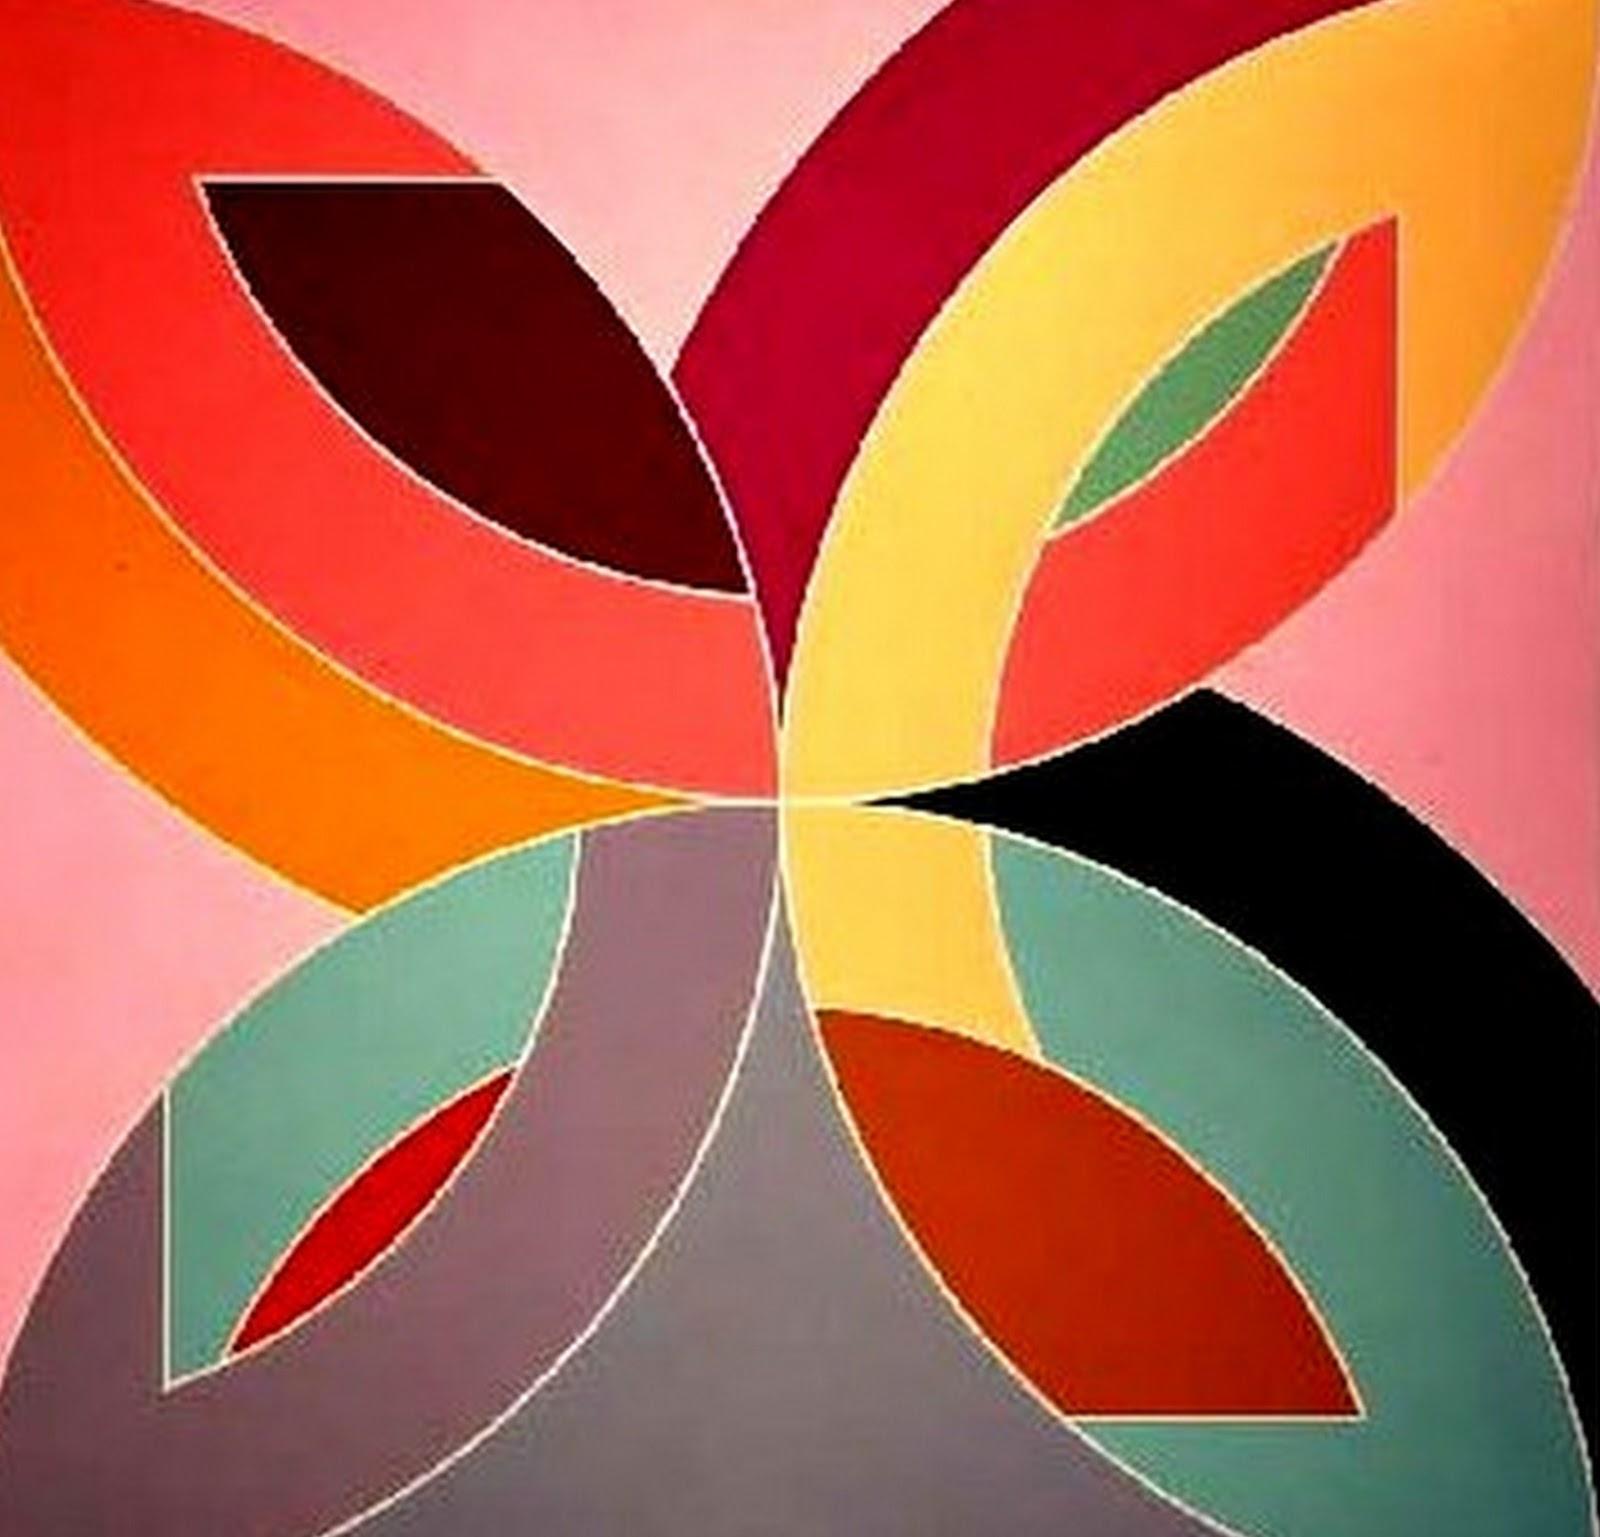 Pintura moderna y fotograf a art stica arte minimalista for Minimal art vertreter